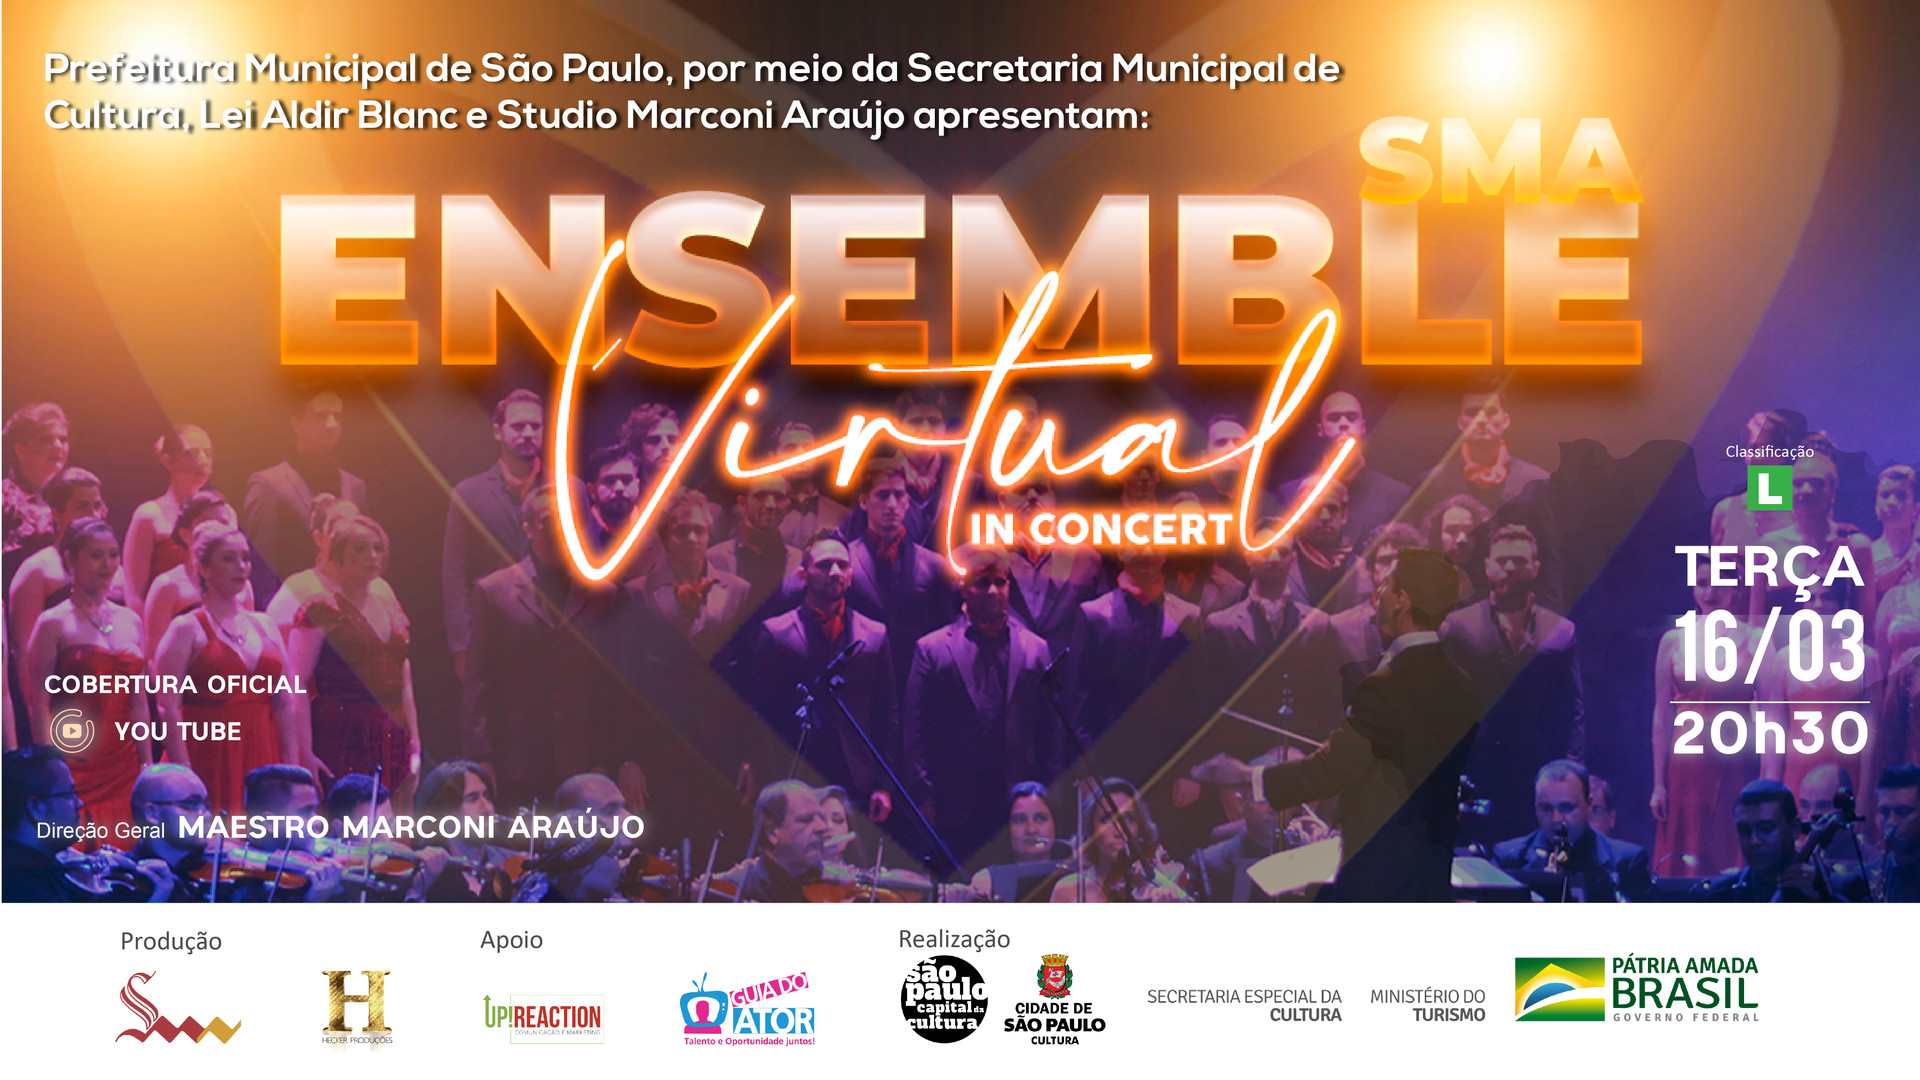 Ensemble Virtual In Concert